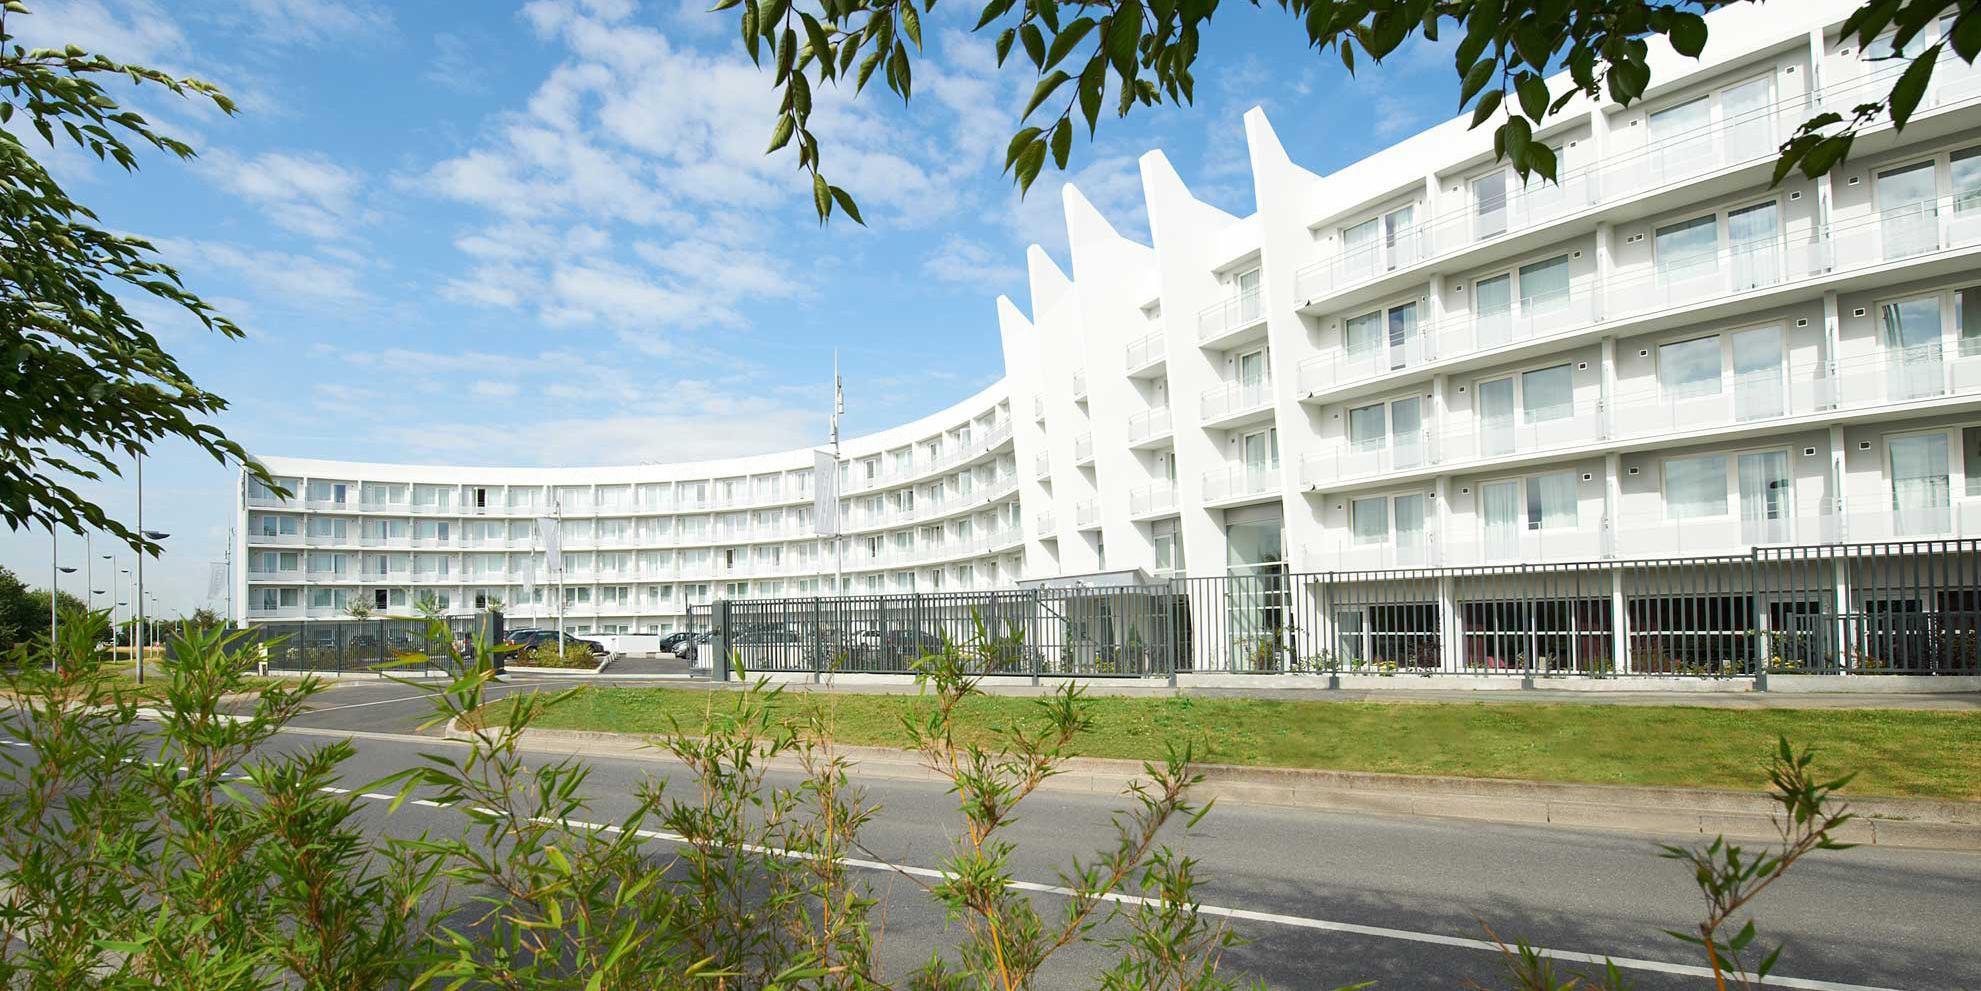 Airport Hotel Crowne Plaza Paris Charles De Gaulle